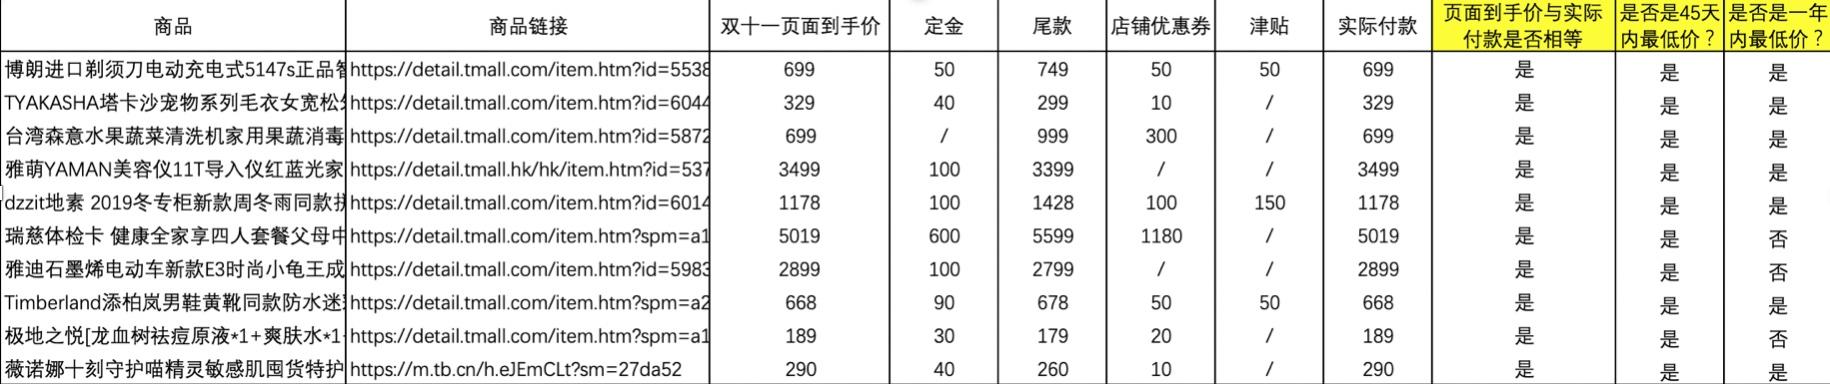 kone娱乐官网注册-体育课玩手机游戏?日本升学名校用AR游戏上体育课